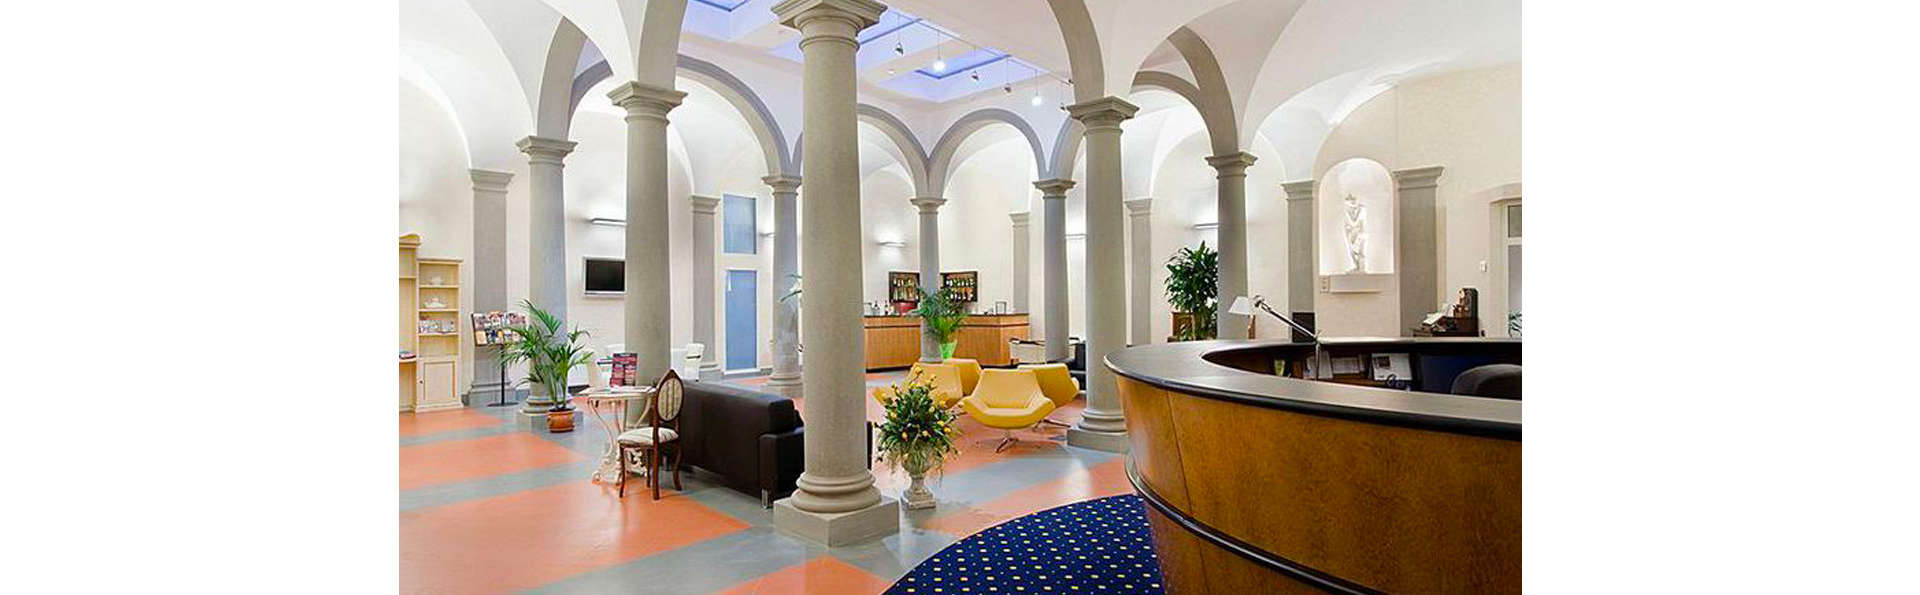 Hotel Centrale  - EDIT_LOBBY_01.jpg